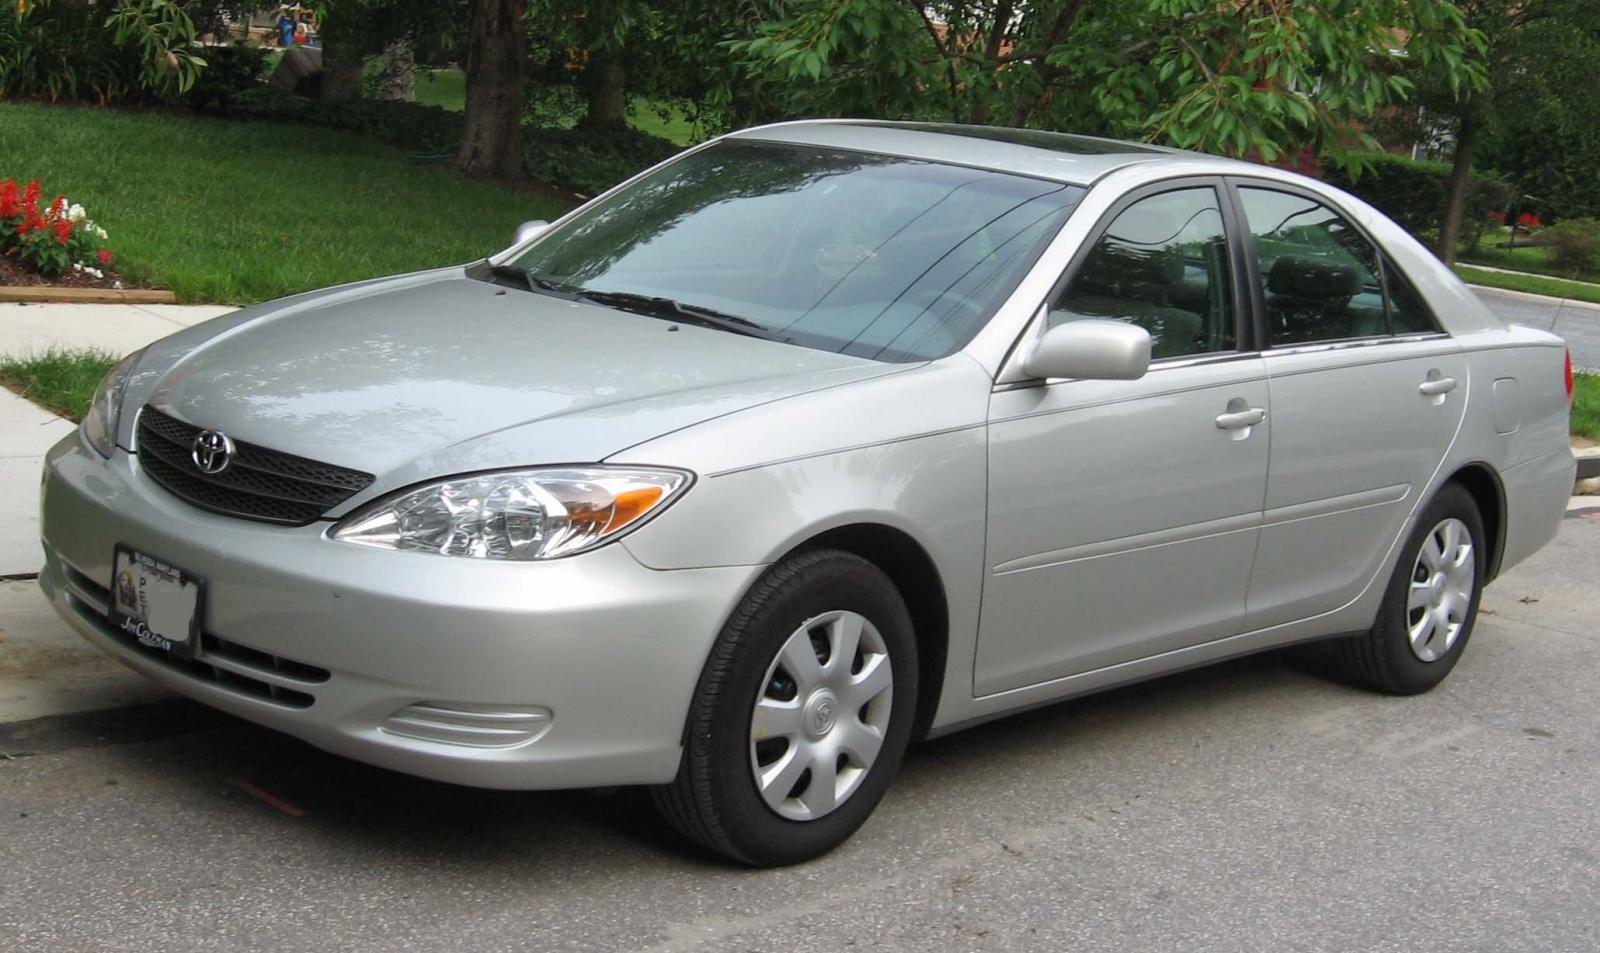 Toyota-camry-2004